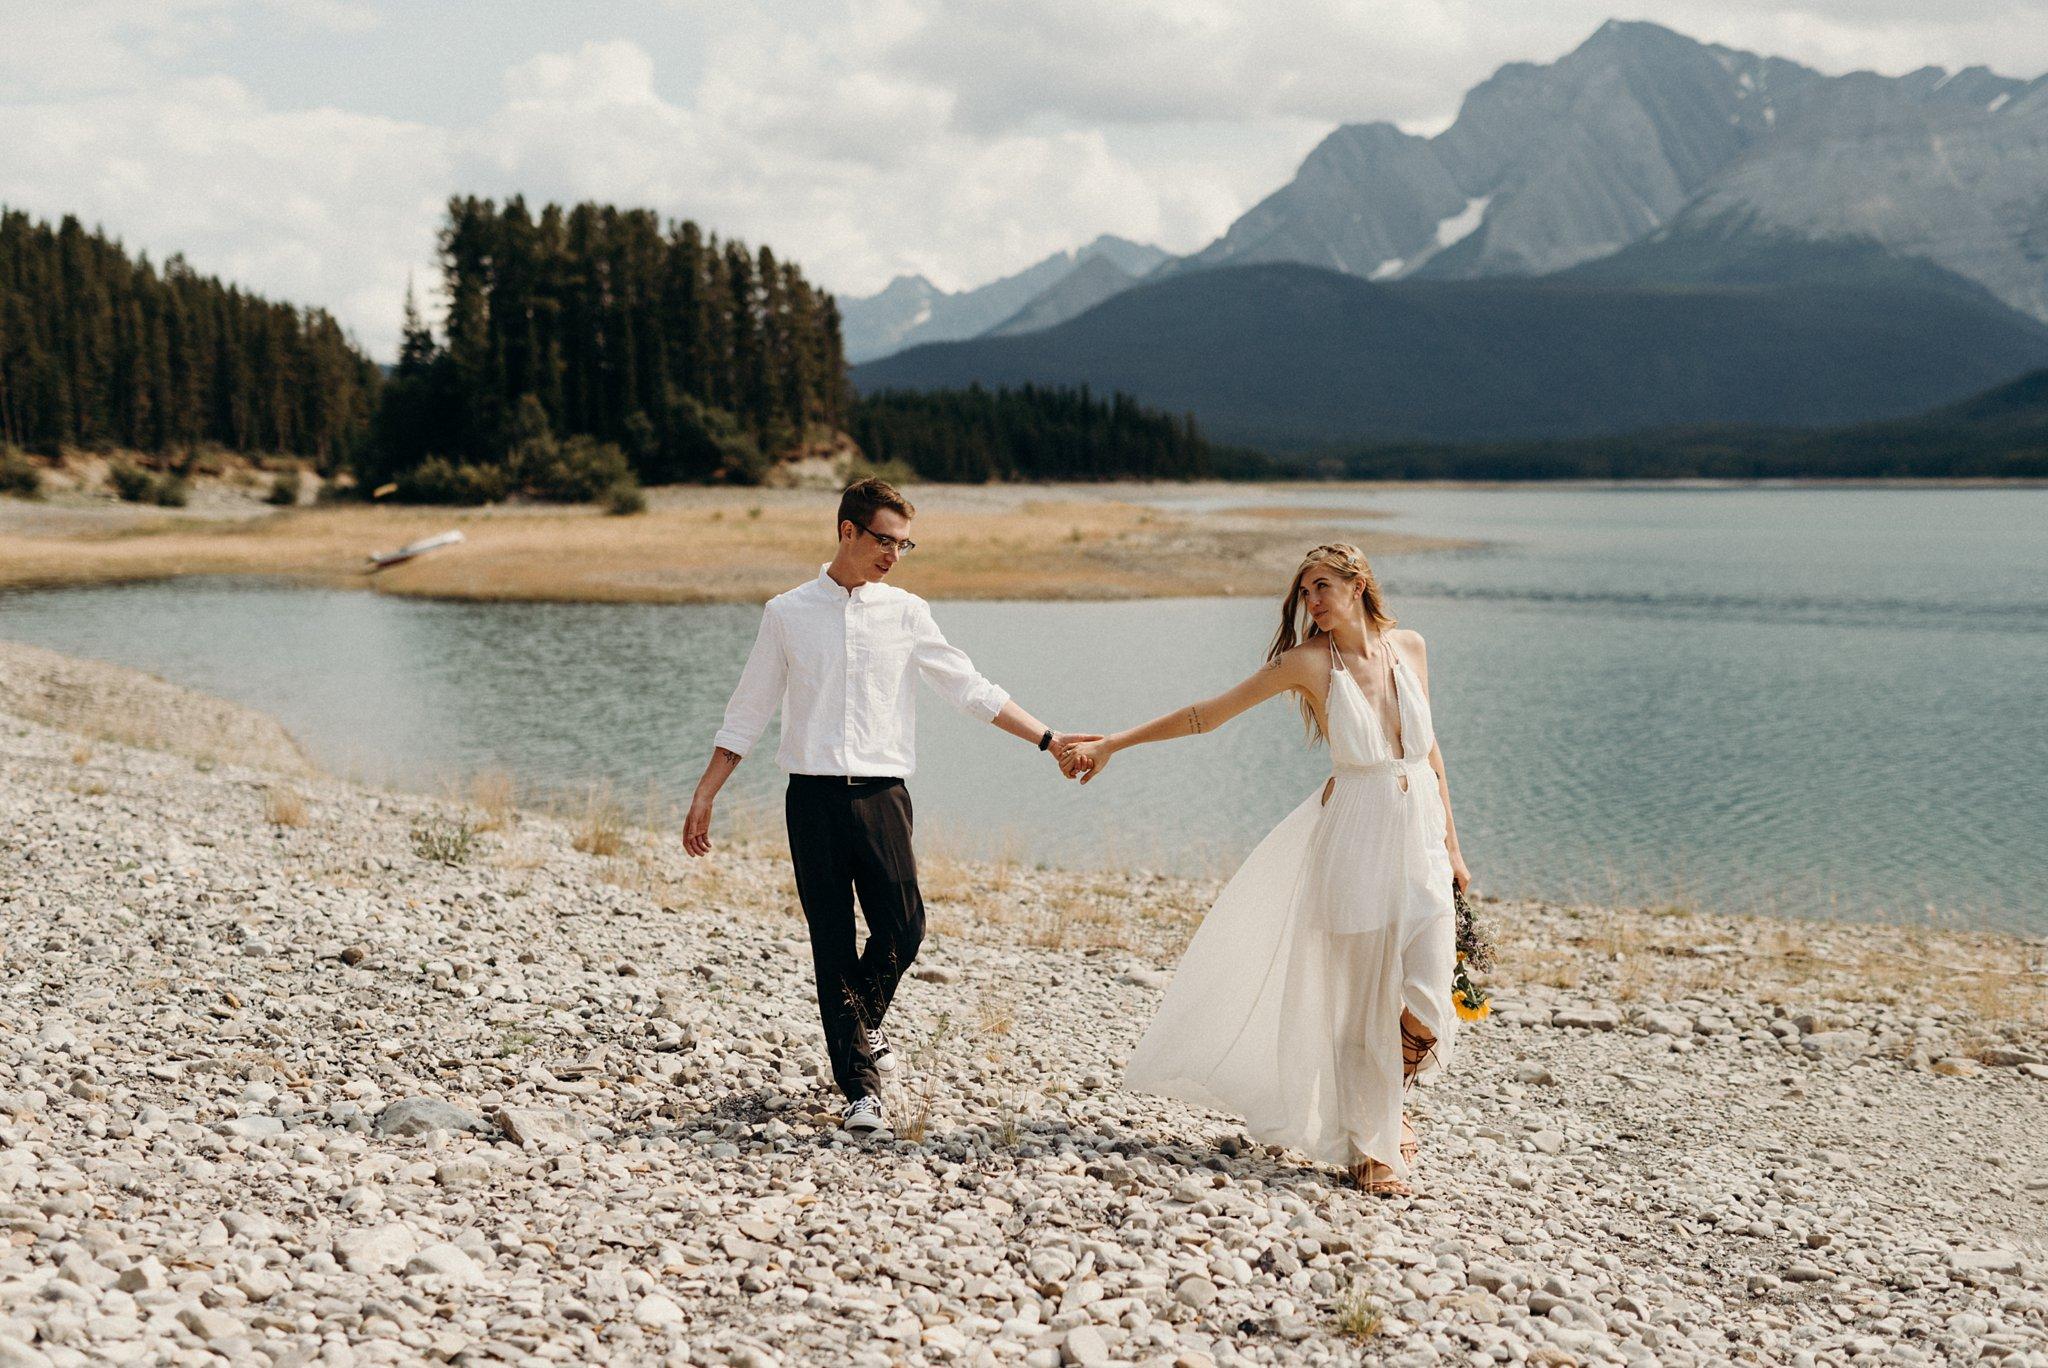 kaihla_tonai_intimate_wedding_elopement_photographer_6410.jpg